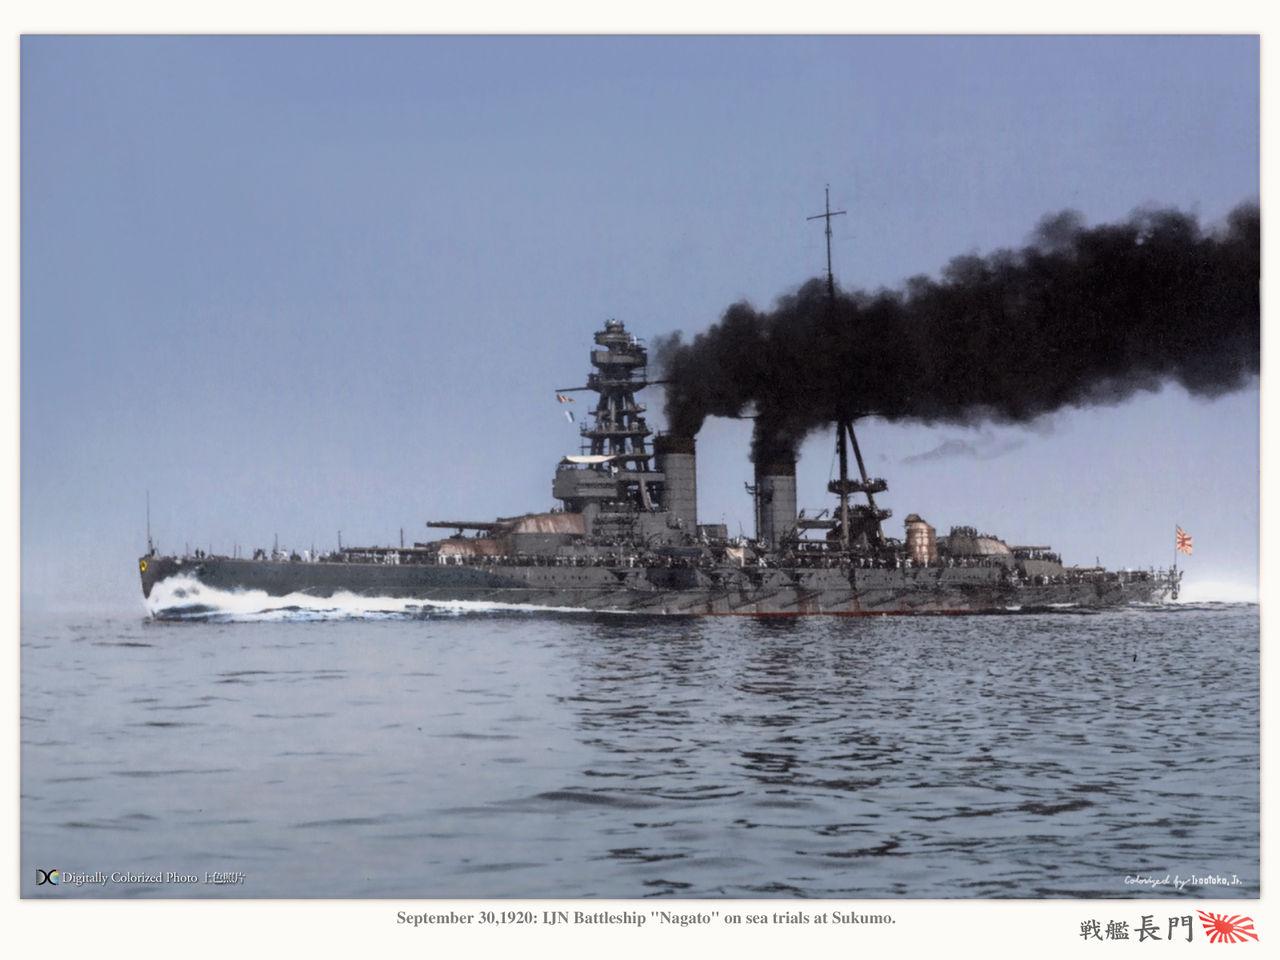 戦艦 長門型 Nagato Class Battleships Monochrome Specter